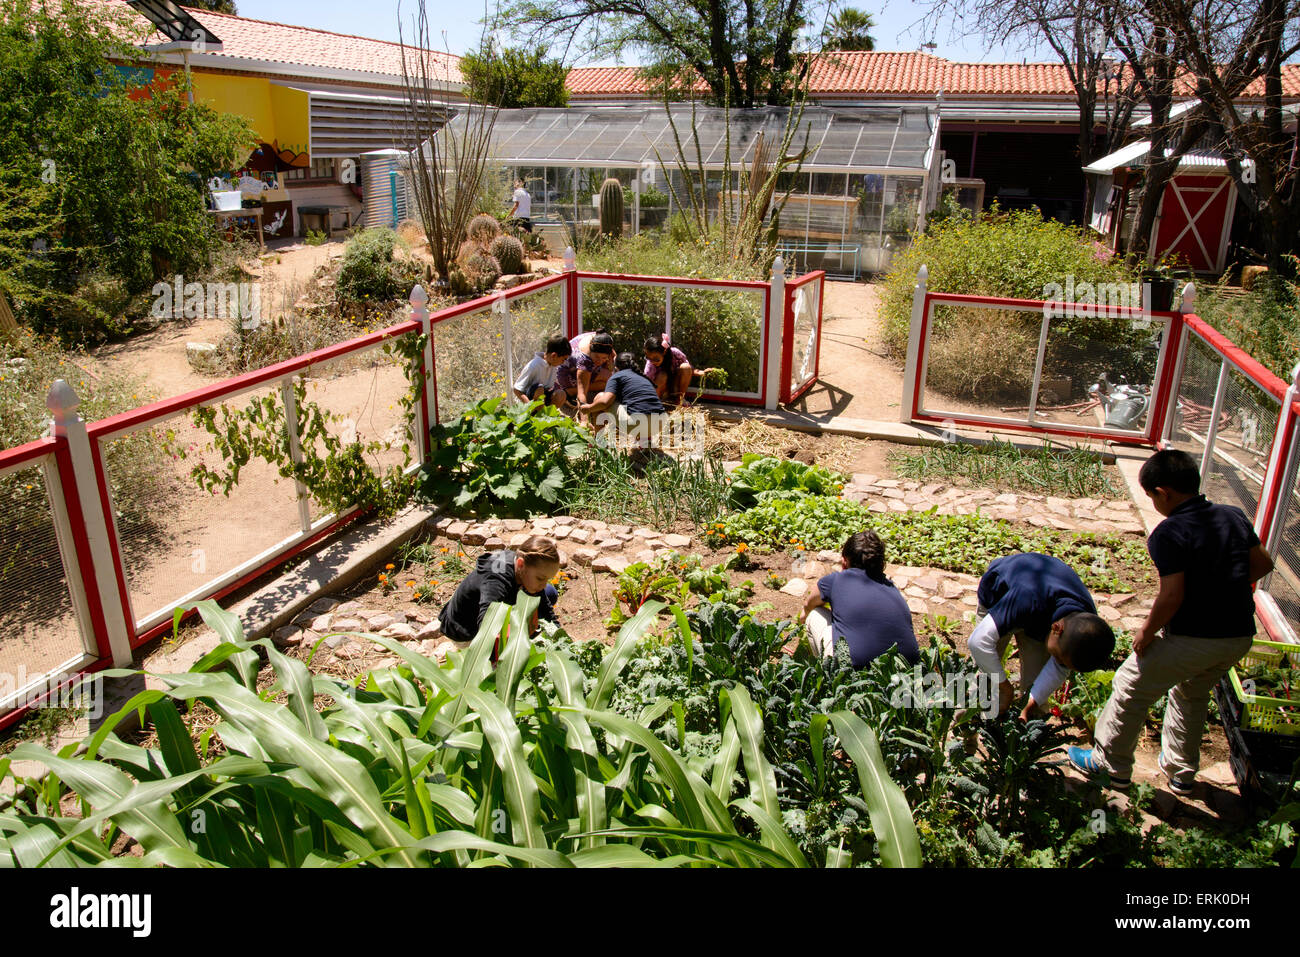 Manzo Elementary School Students Work In The Schoolu0027s Organic Garden, Tucson,  Arizona, USA.